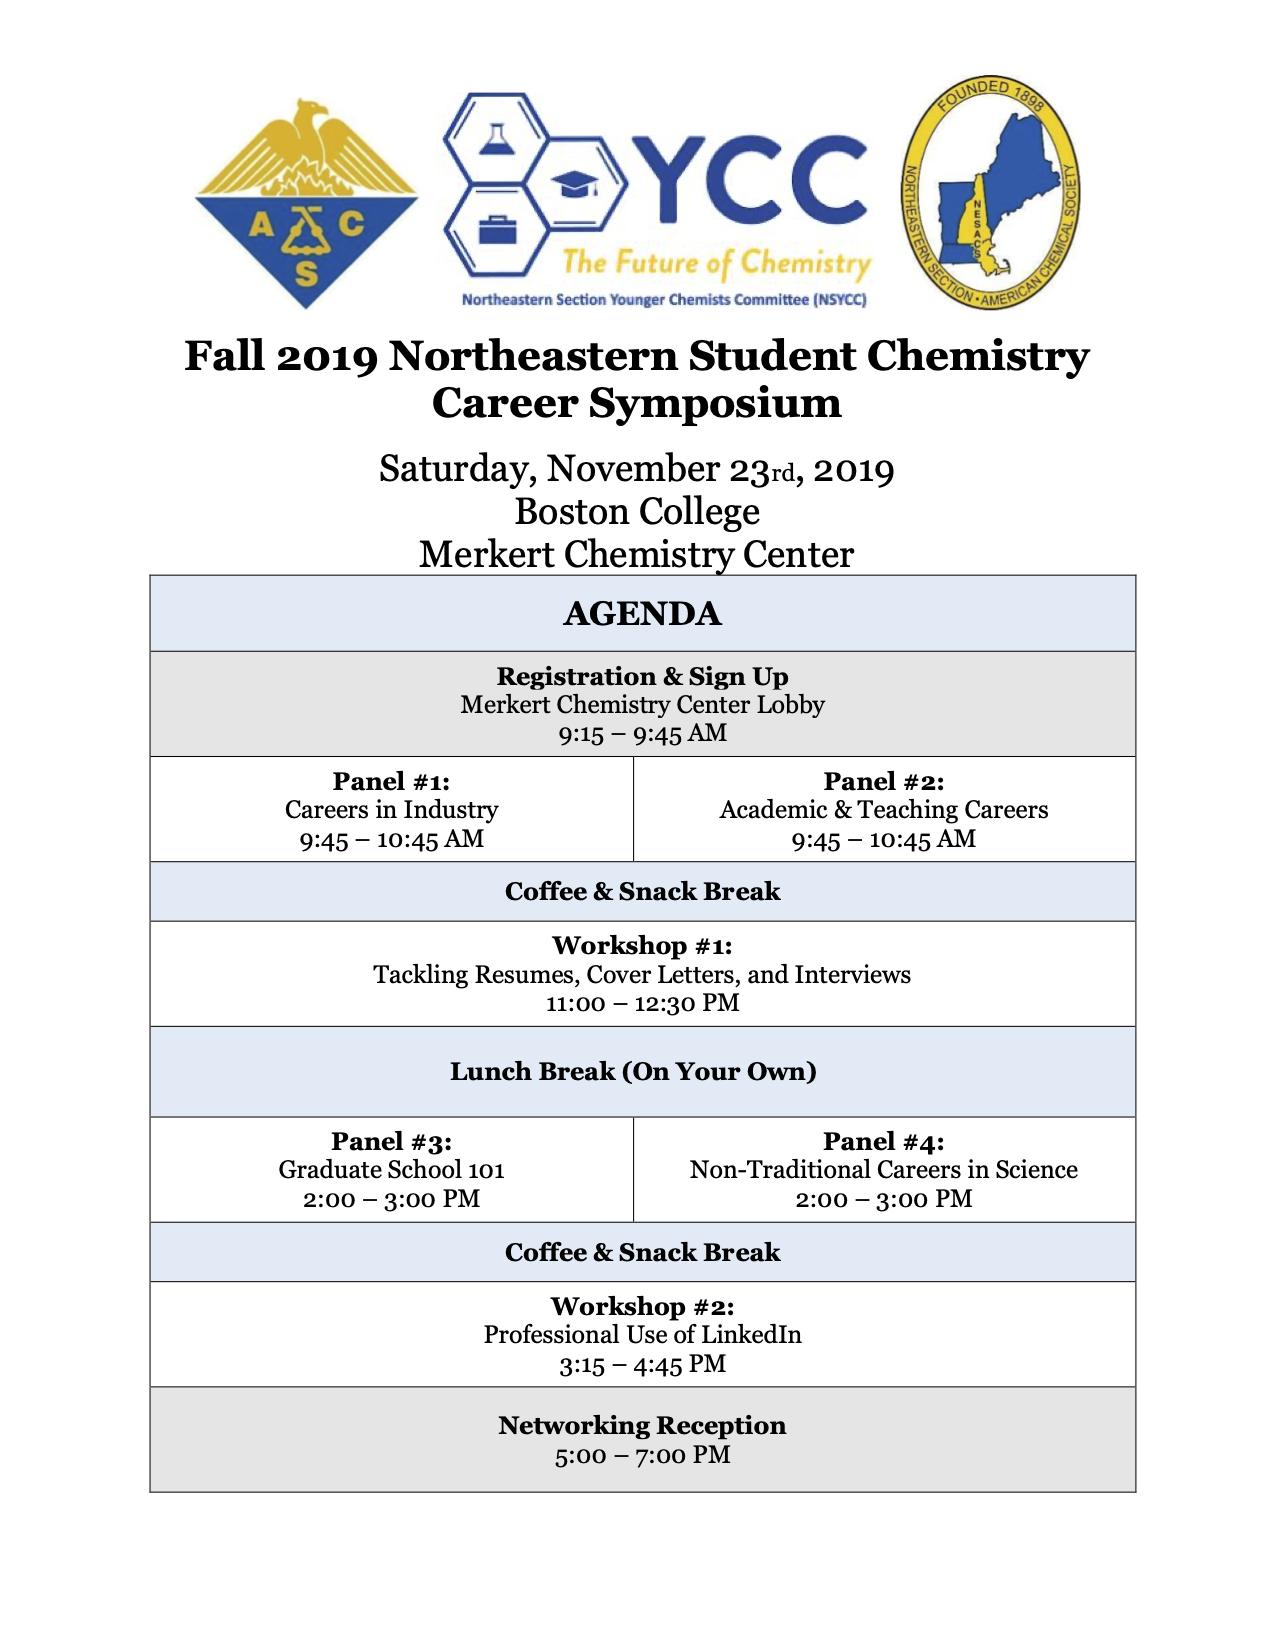 NSYCC Fall 2019 Career Symposium Schedule